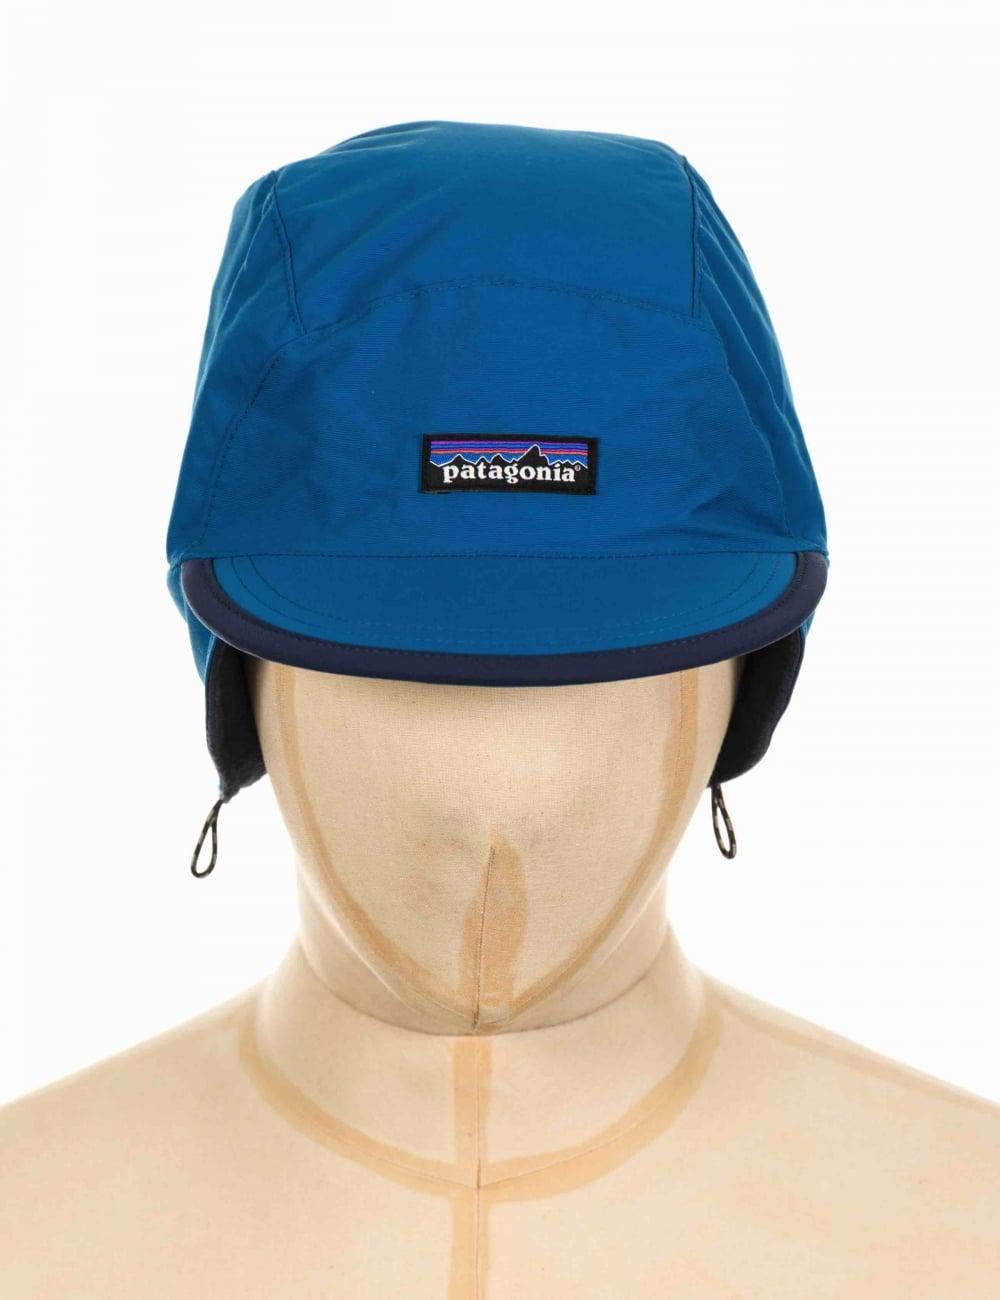 3b6d07c9129 Patagonia Shelled Synchilla Duckbill Cap - Big Sur Blue - Hat Shop ...